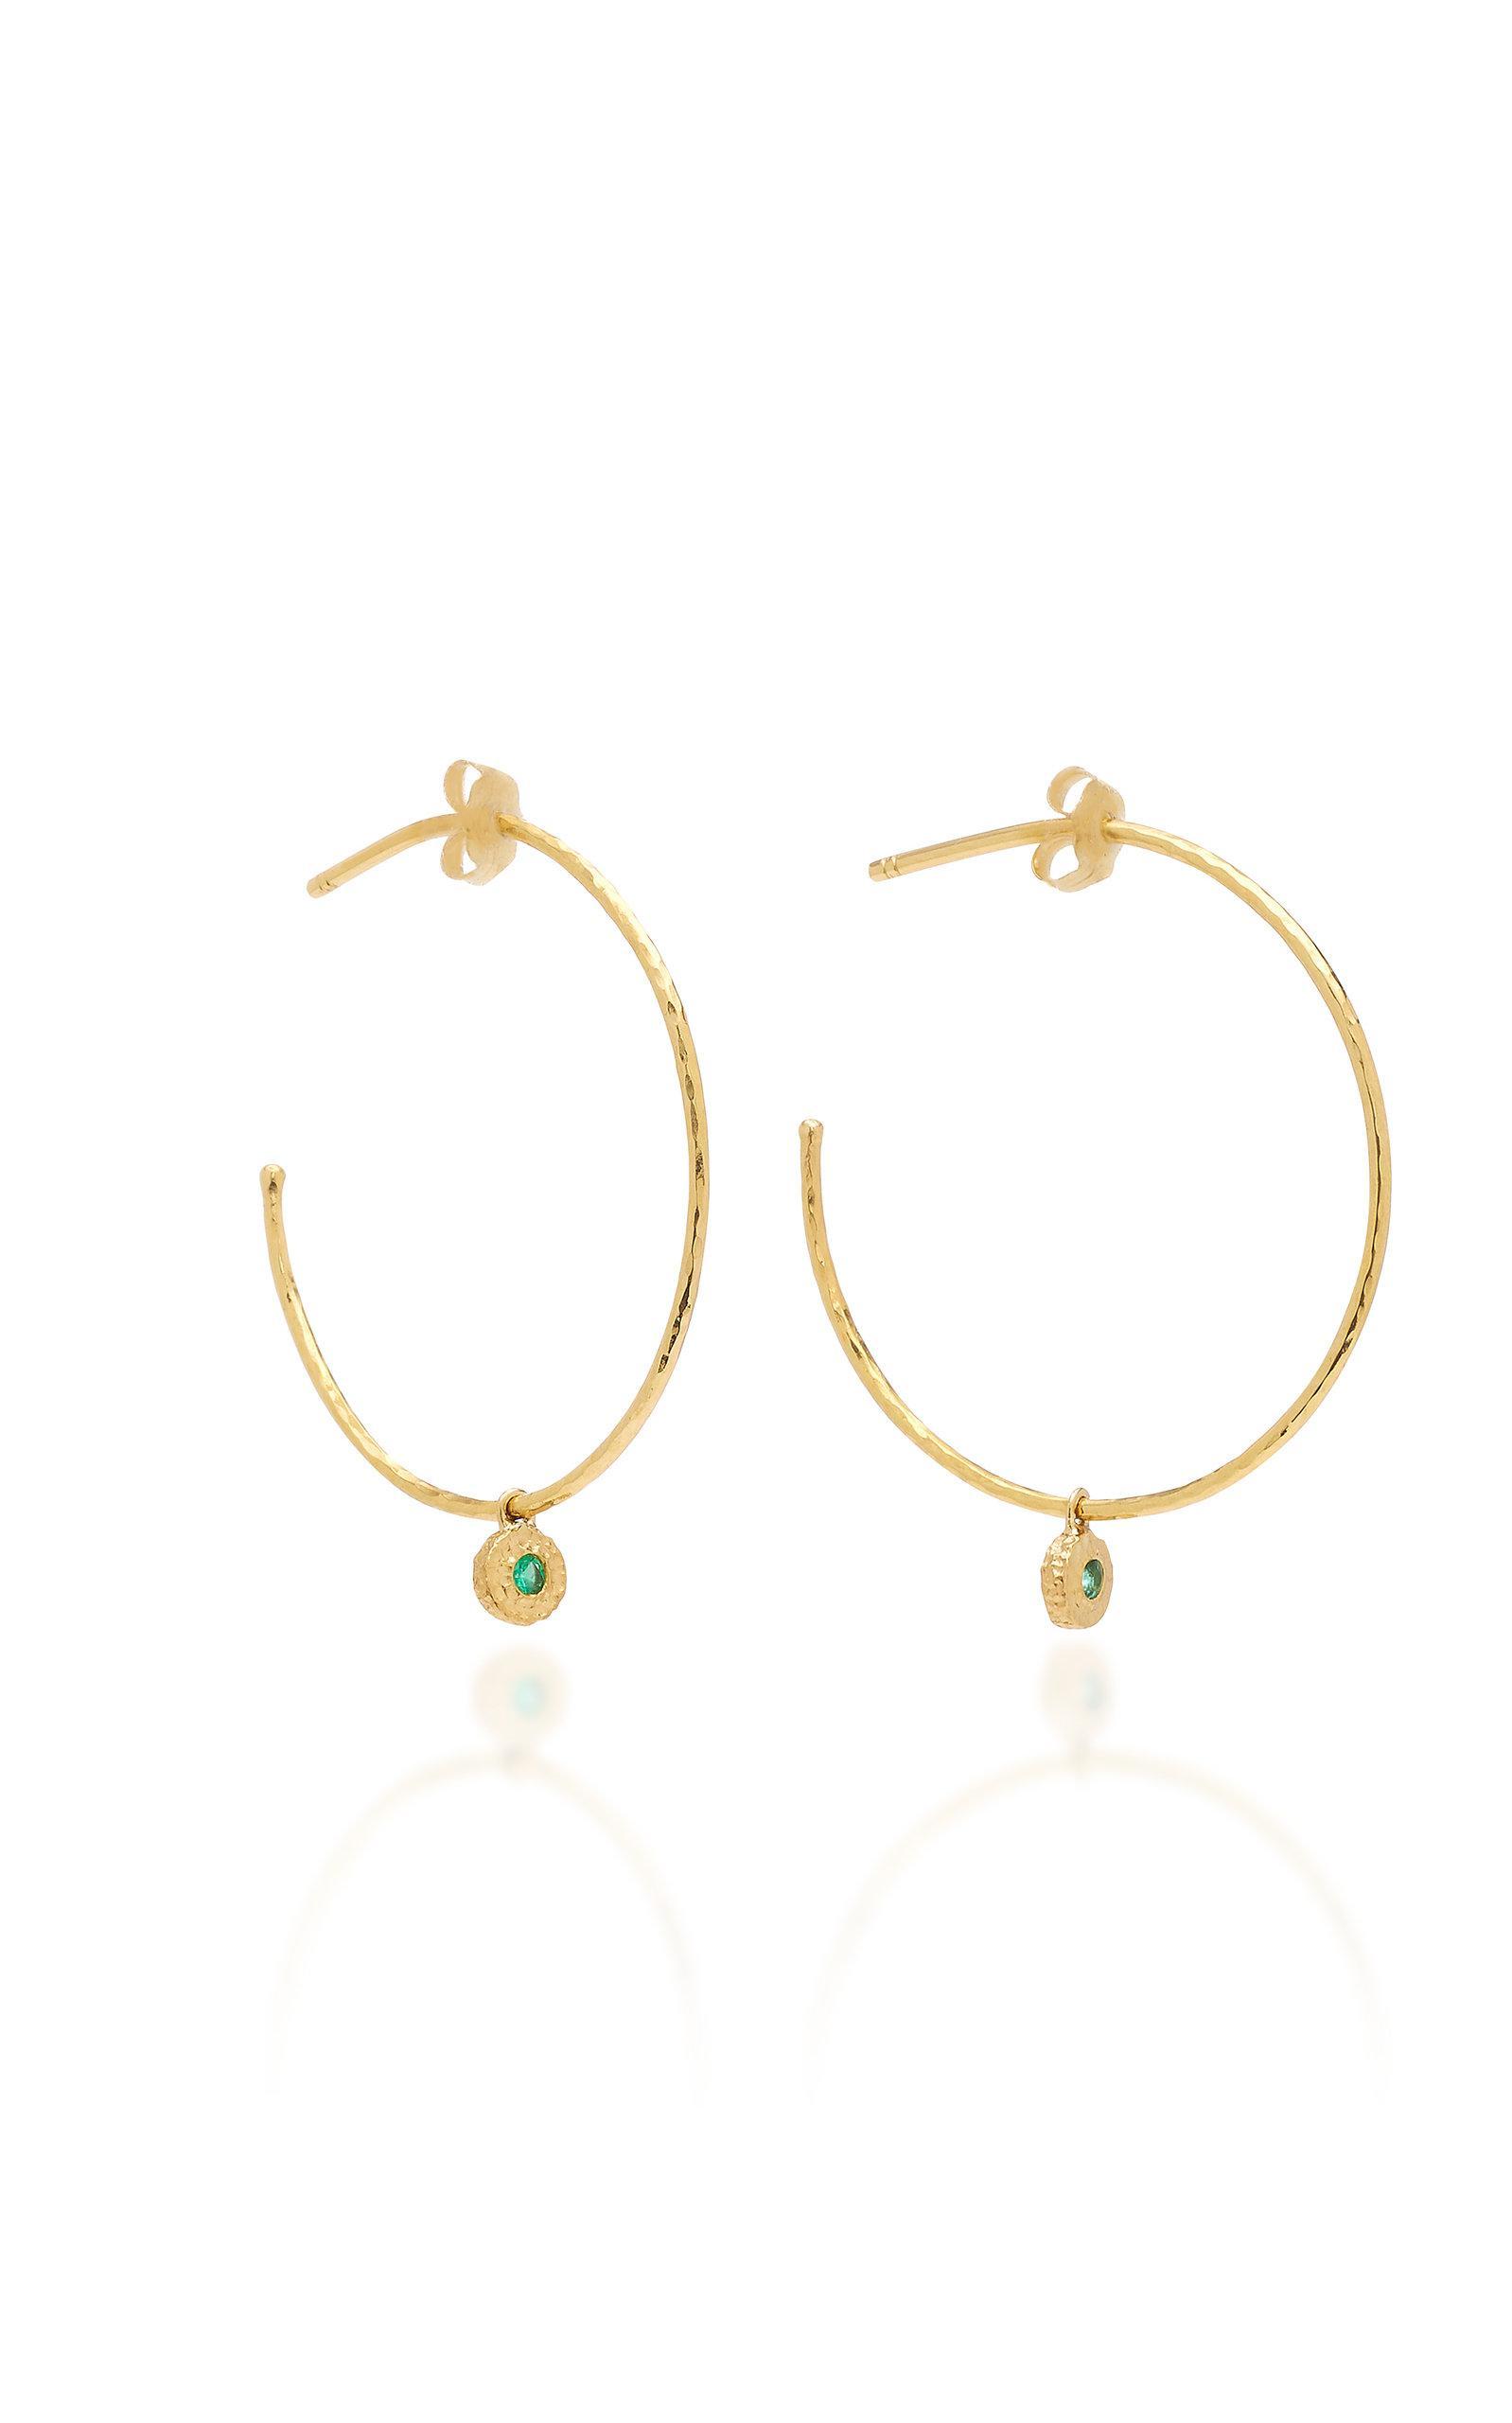 Nesting Gem Tourmaline and 18K Gold Drop Earrings Octavia Elizabeth ztUNyT4es